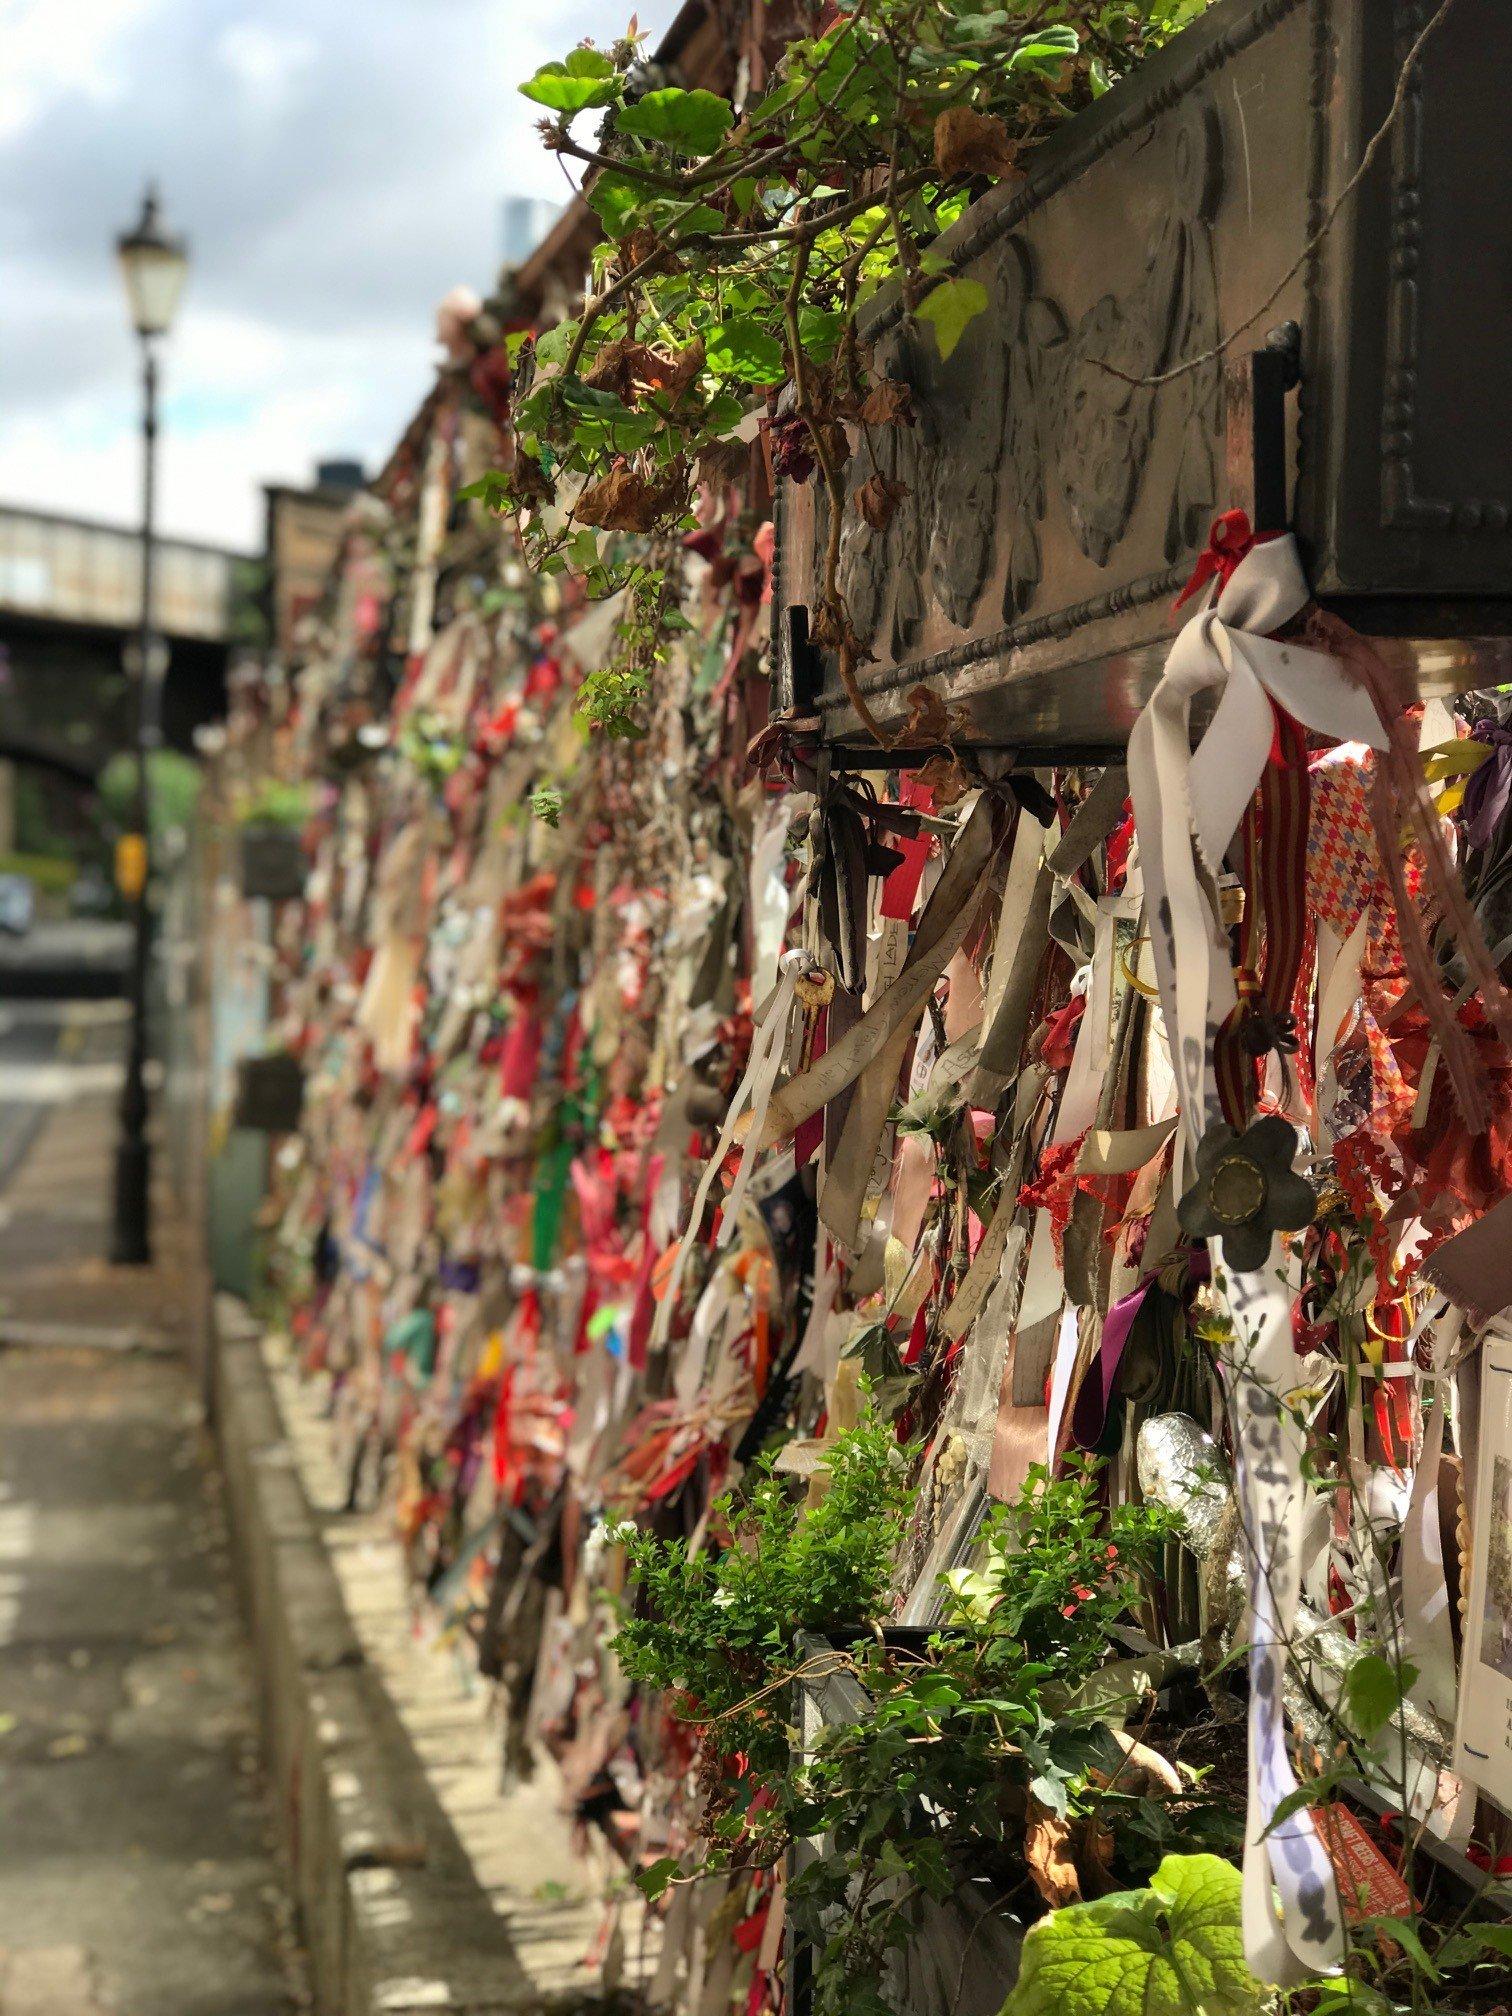 Tied ribbon memorial wall at Crossbones Graveyard gates in Redcross Way